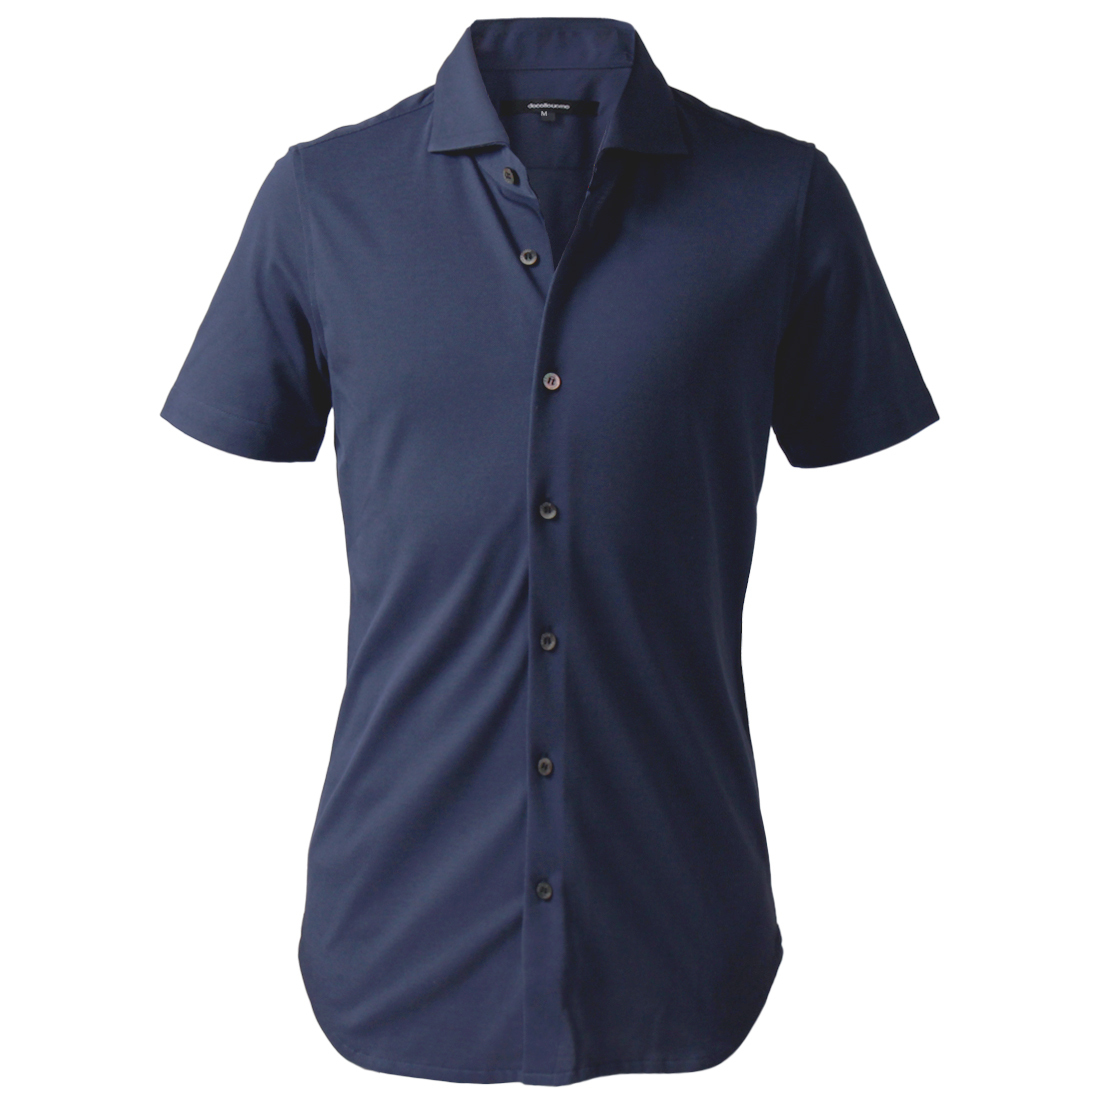 DJS-004 decollouomo メンズドレスシャツ半袖 concorde - ライトネイビー